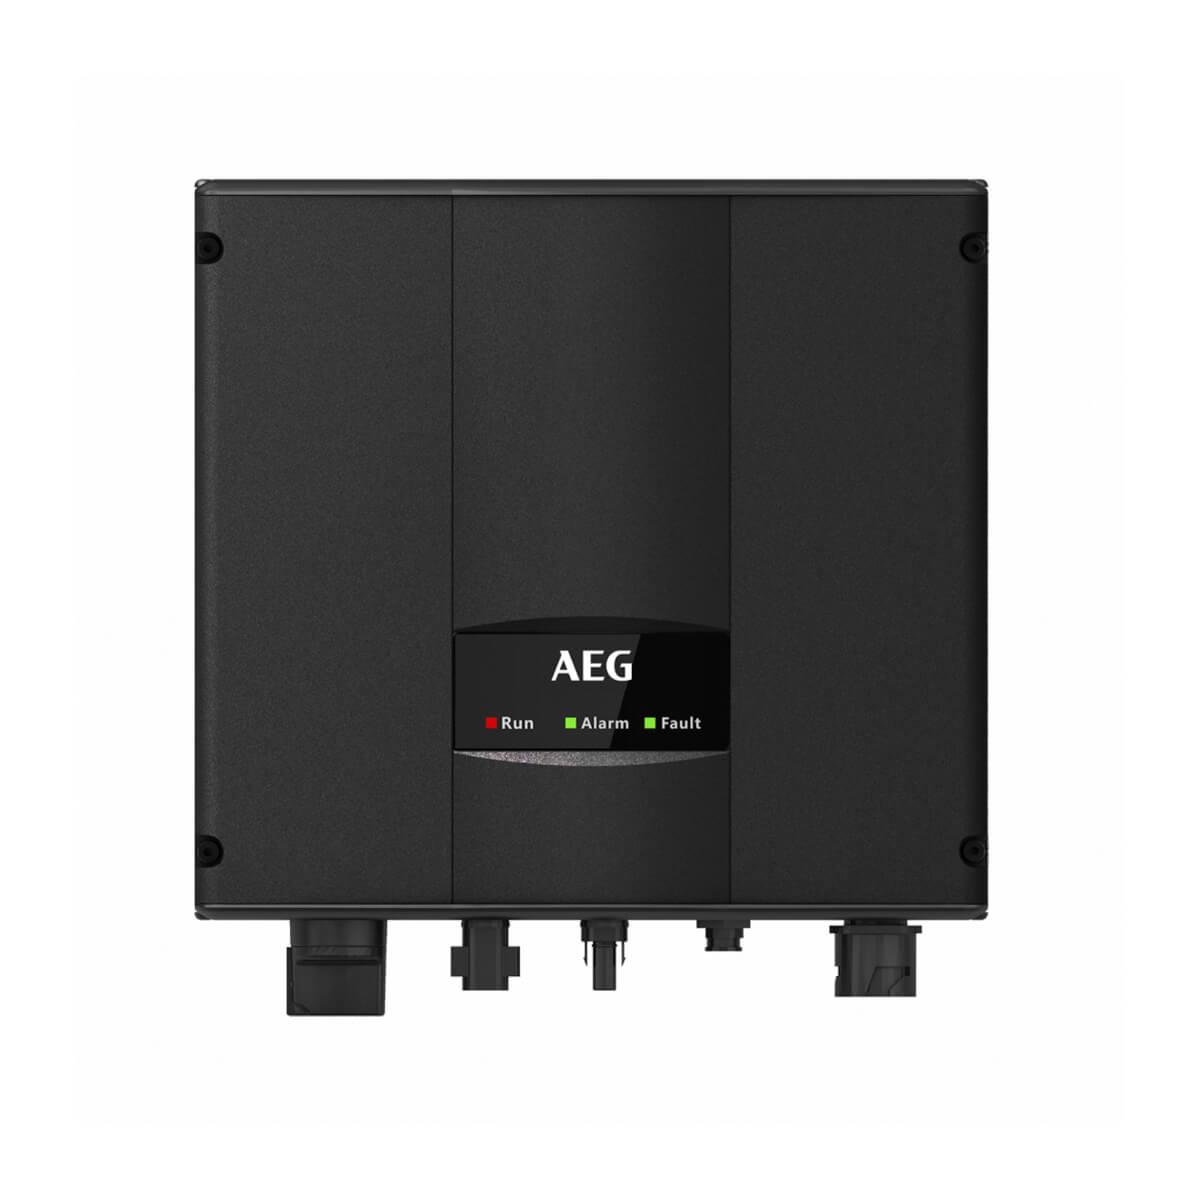 aeg 5kW inverter, aeg as-ir01 5kW inverter, aeg as-ir01-5000 inverter, aeg as-ir01-5000, aeg as-ir01 5kW